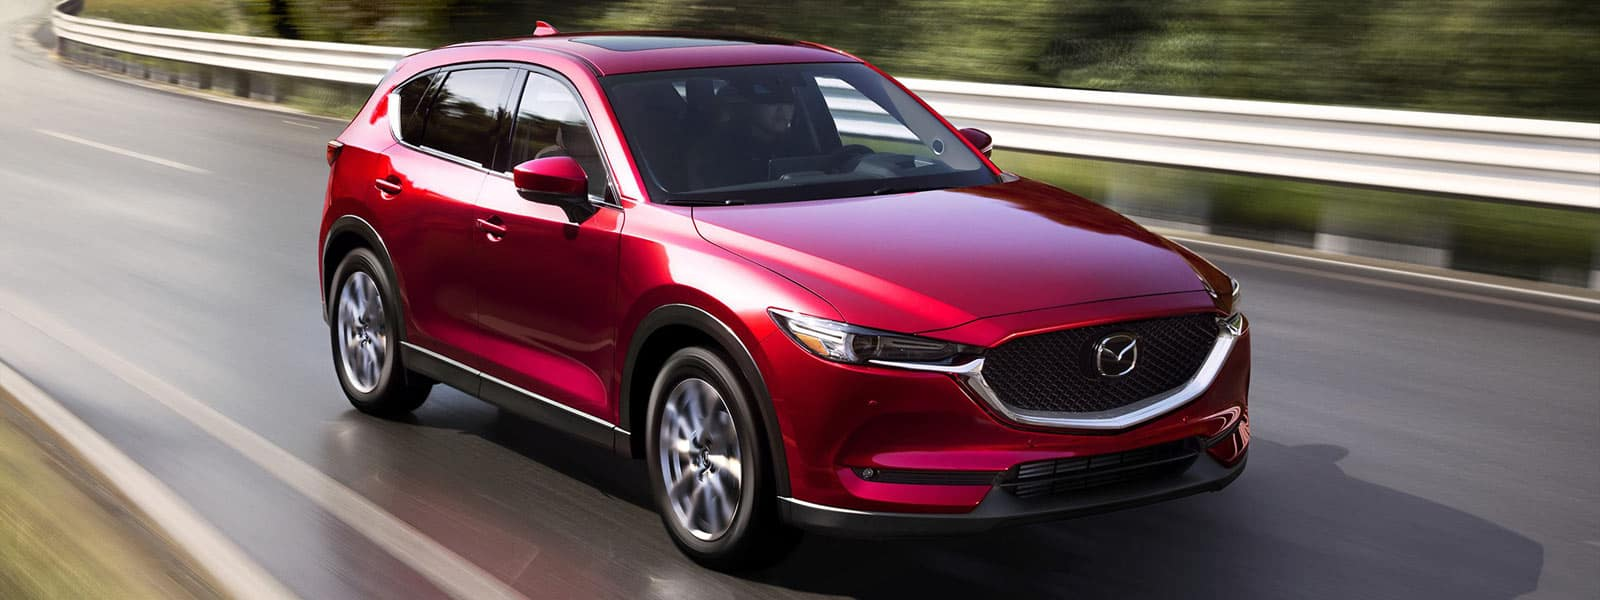 Buy or lease new Mazda CX-5 in Tuscaloosa Alabama